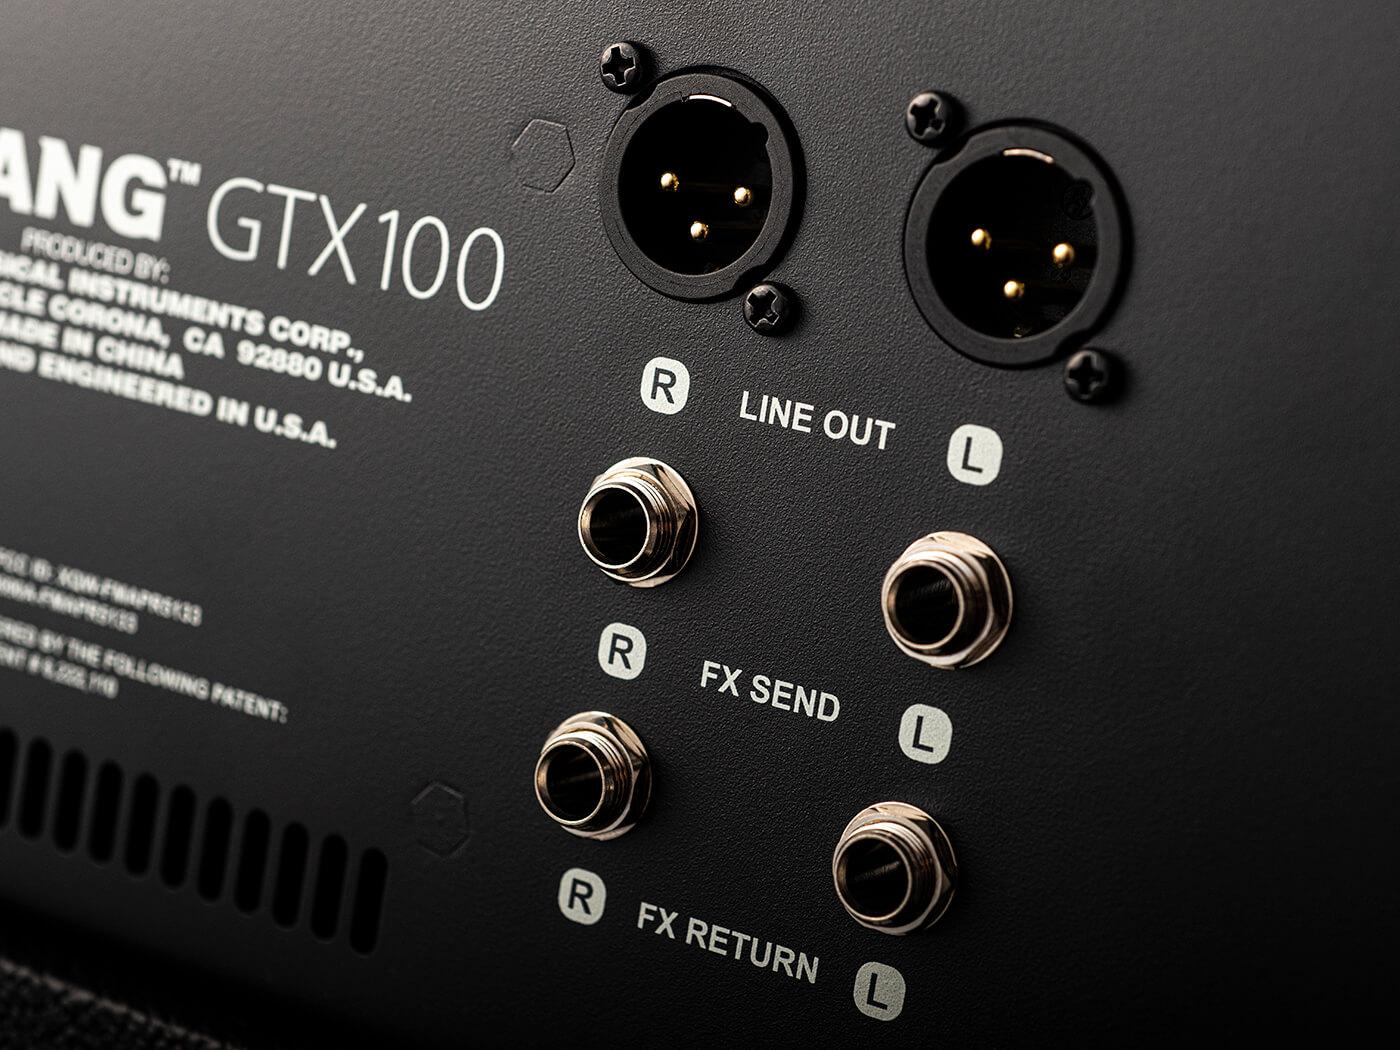 Fender Mustang GTX100 IO